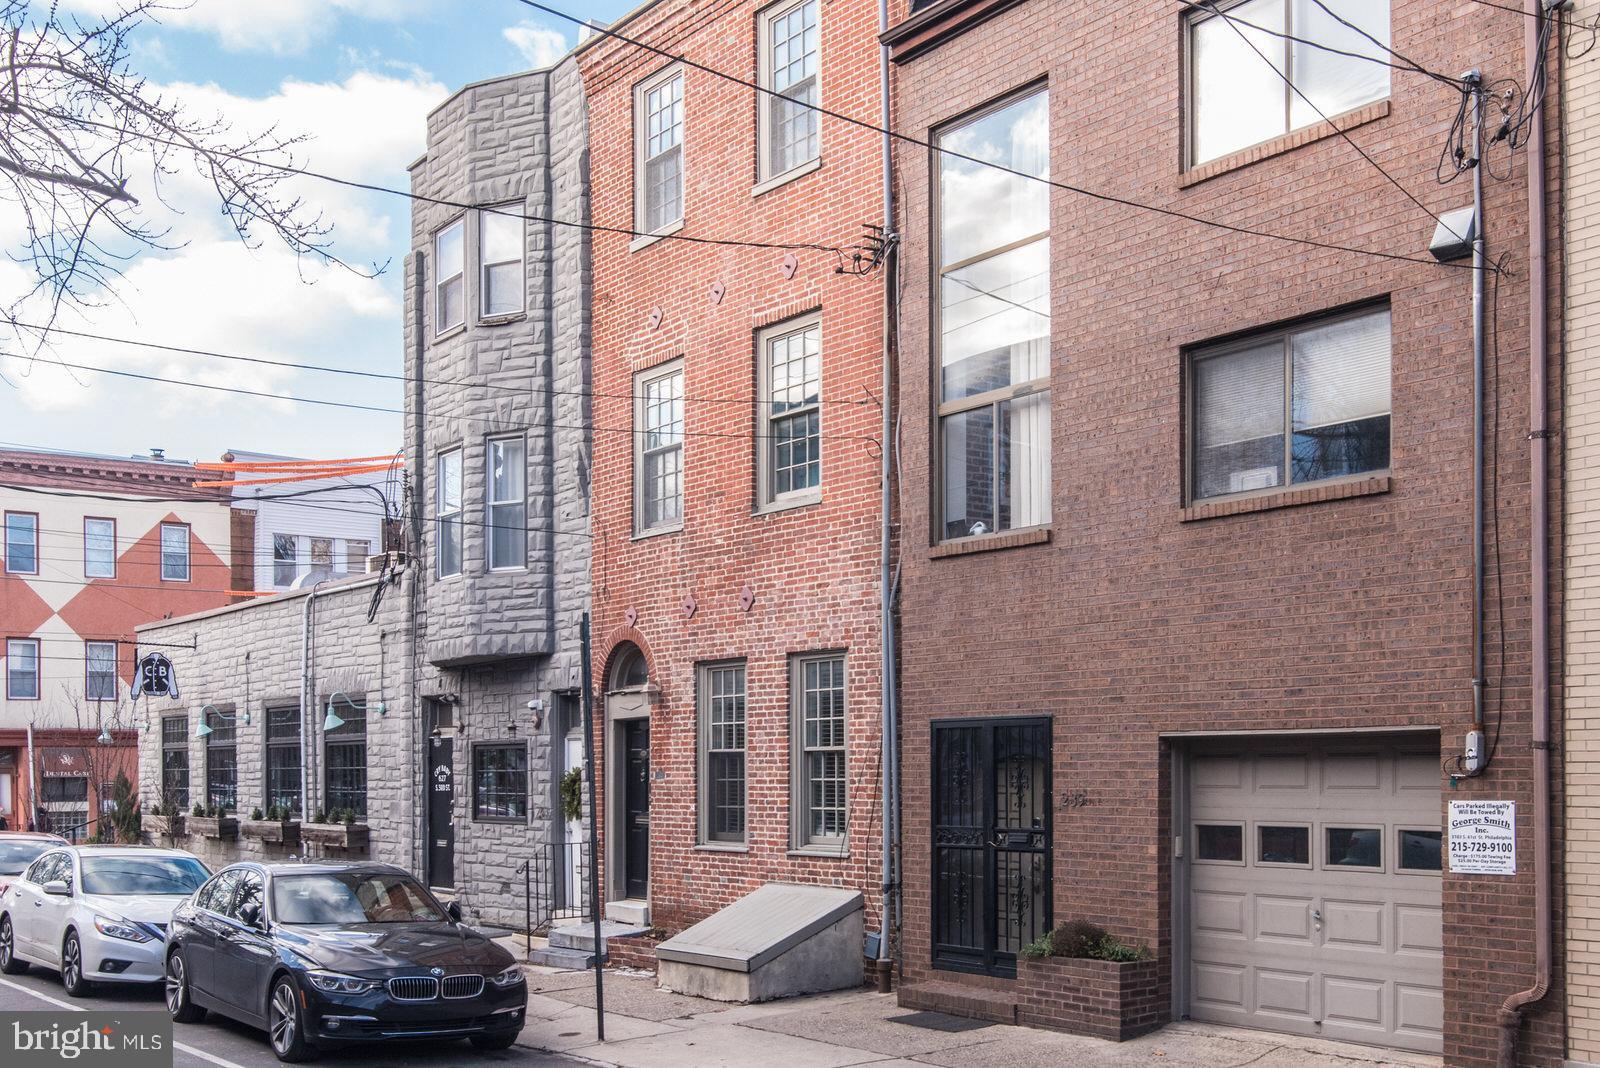 241 Bainbridge St, Philadelphia, PA, 19147